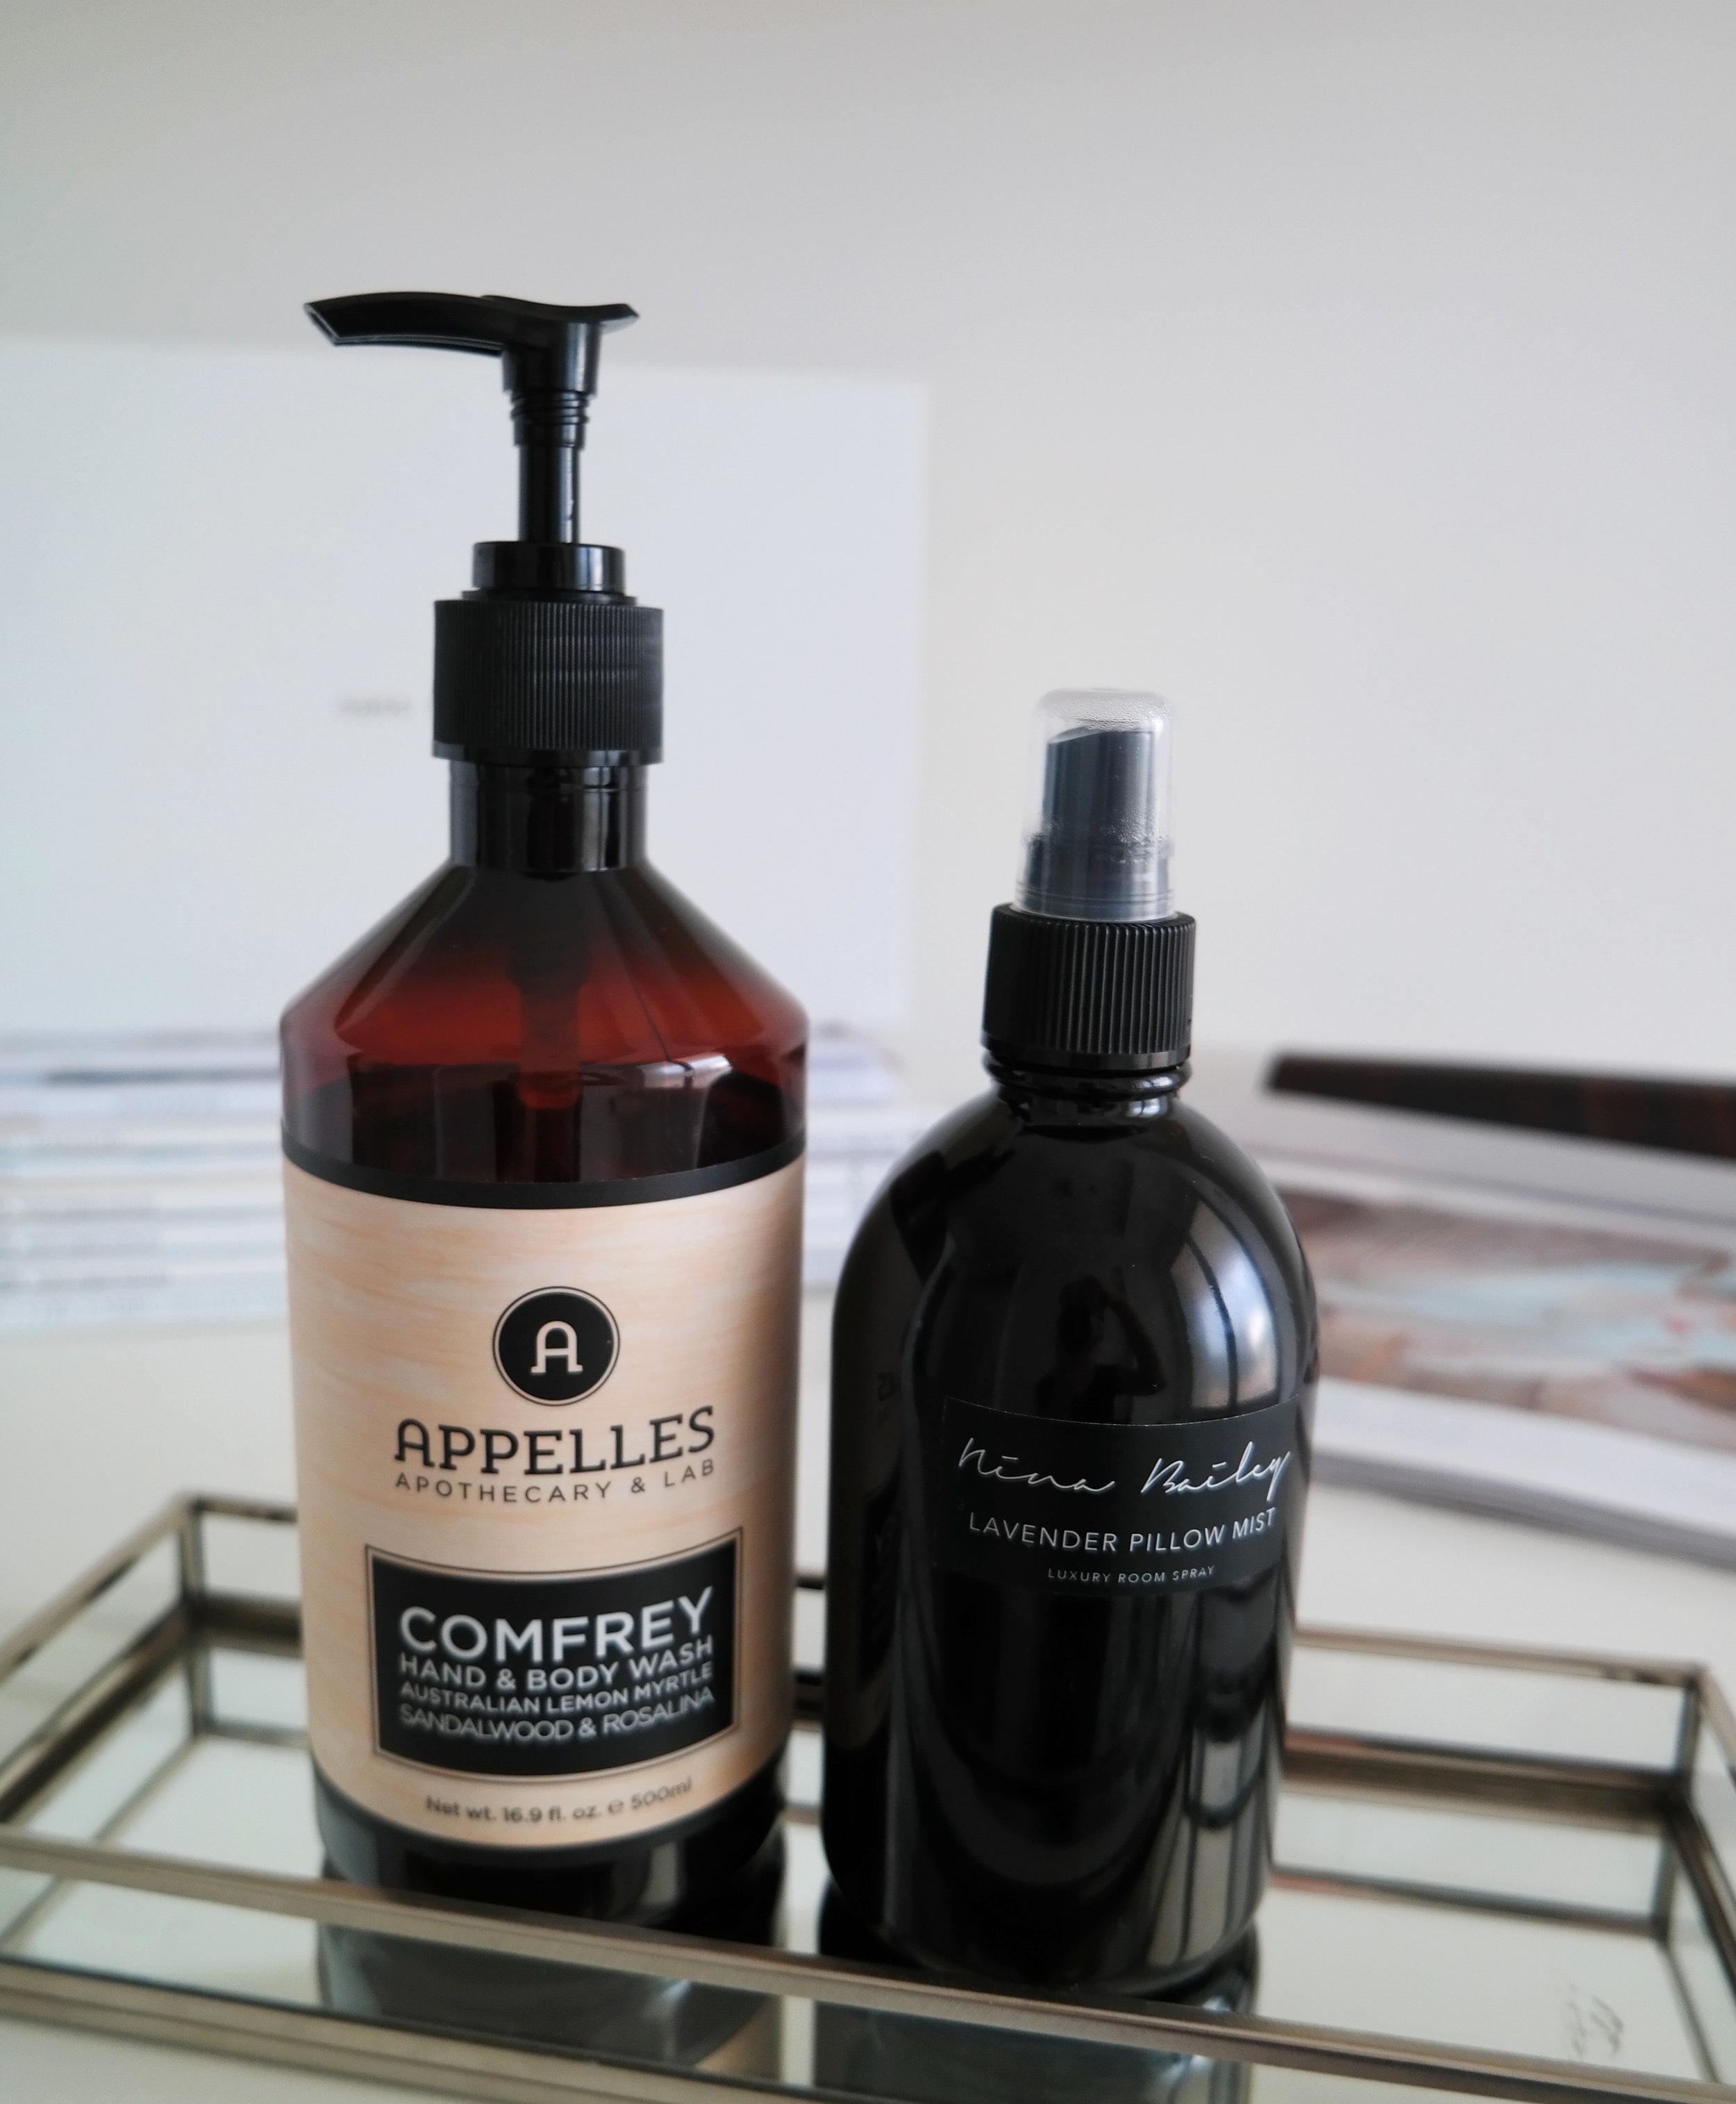 Apelles Comfrey Hand and Body Wash / Nina Bailey Lavender Pillow Mist